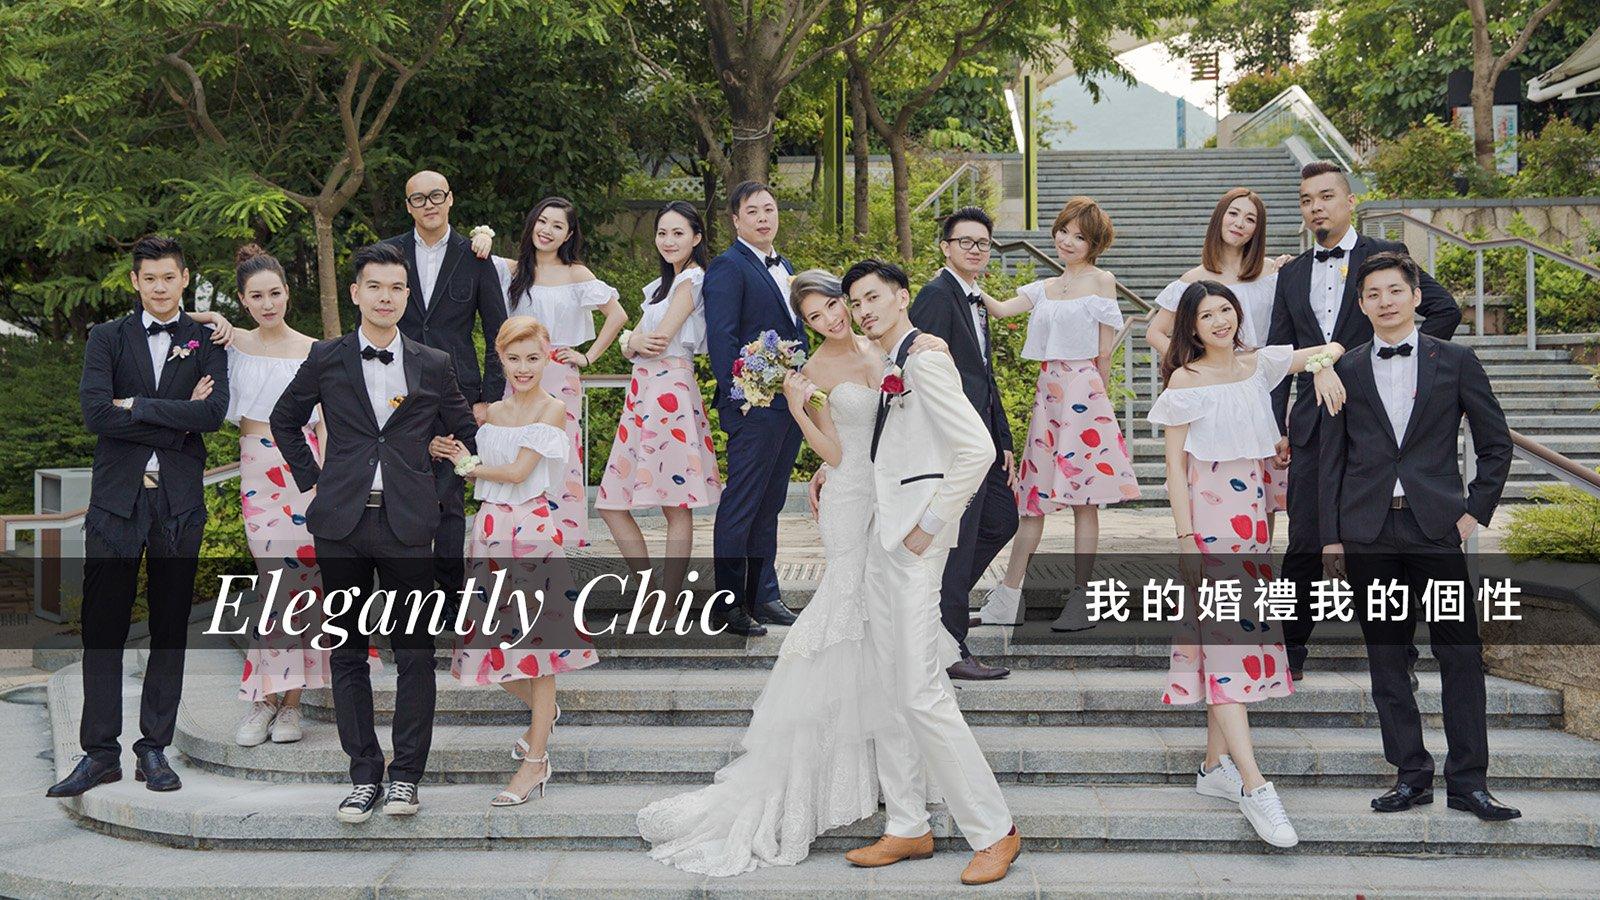 【我的婚禮我的個性 ELEGANTLY CHIC 】| Wedding Day Photography | 婚禮攝影[有片]